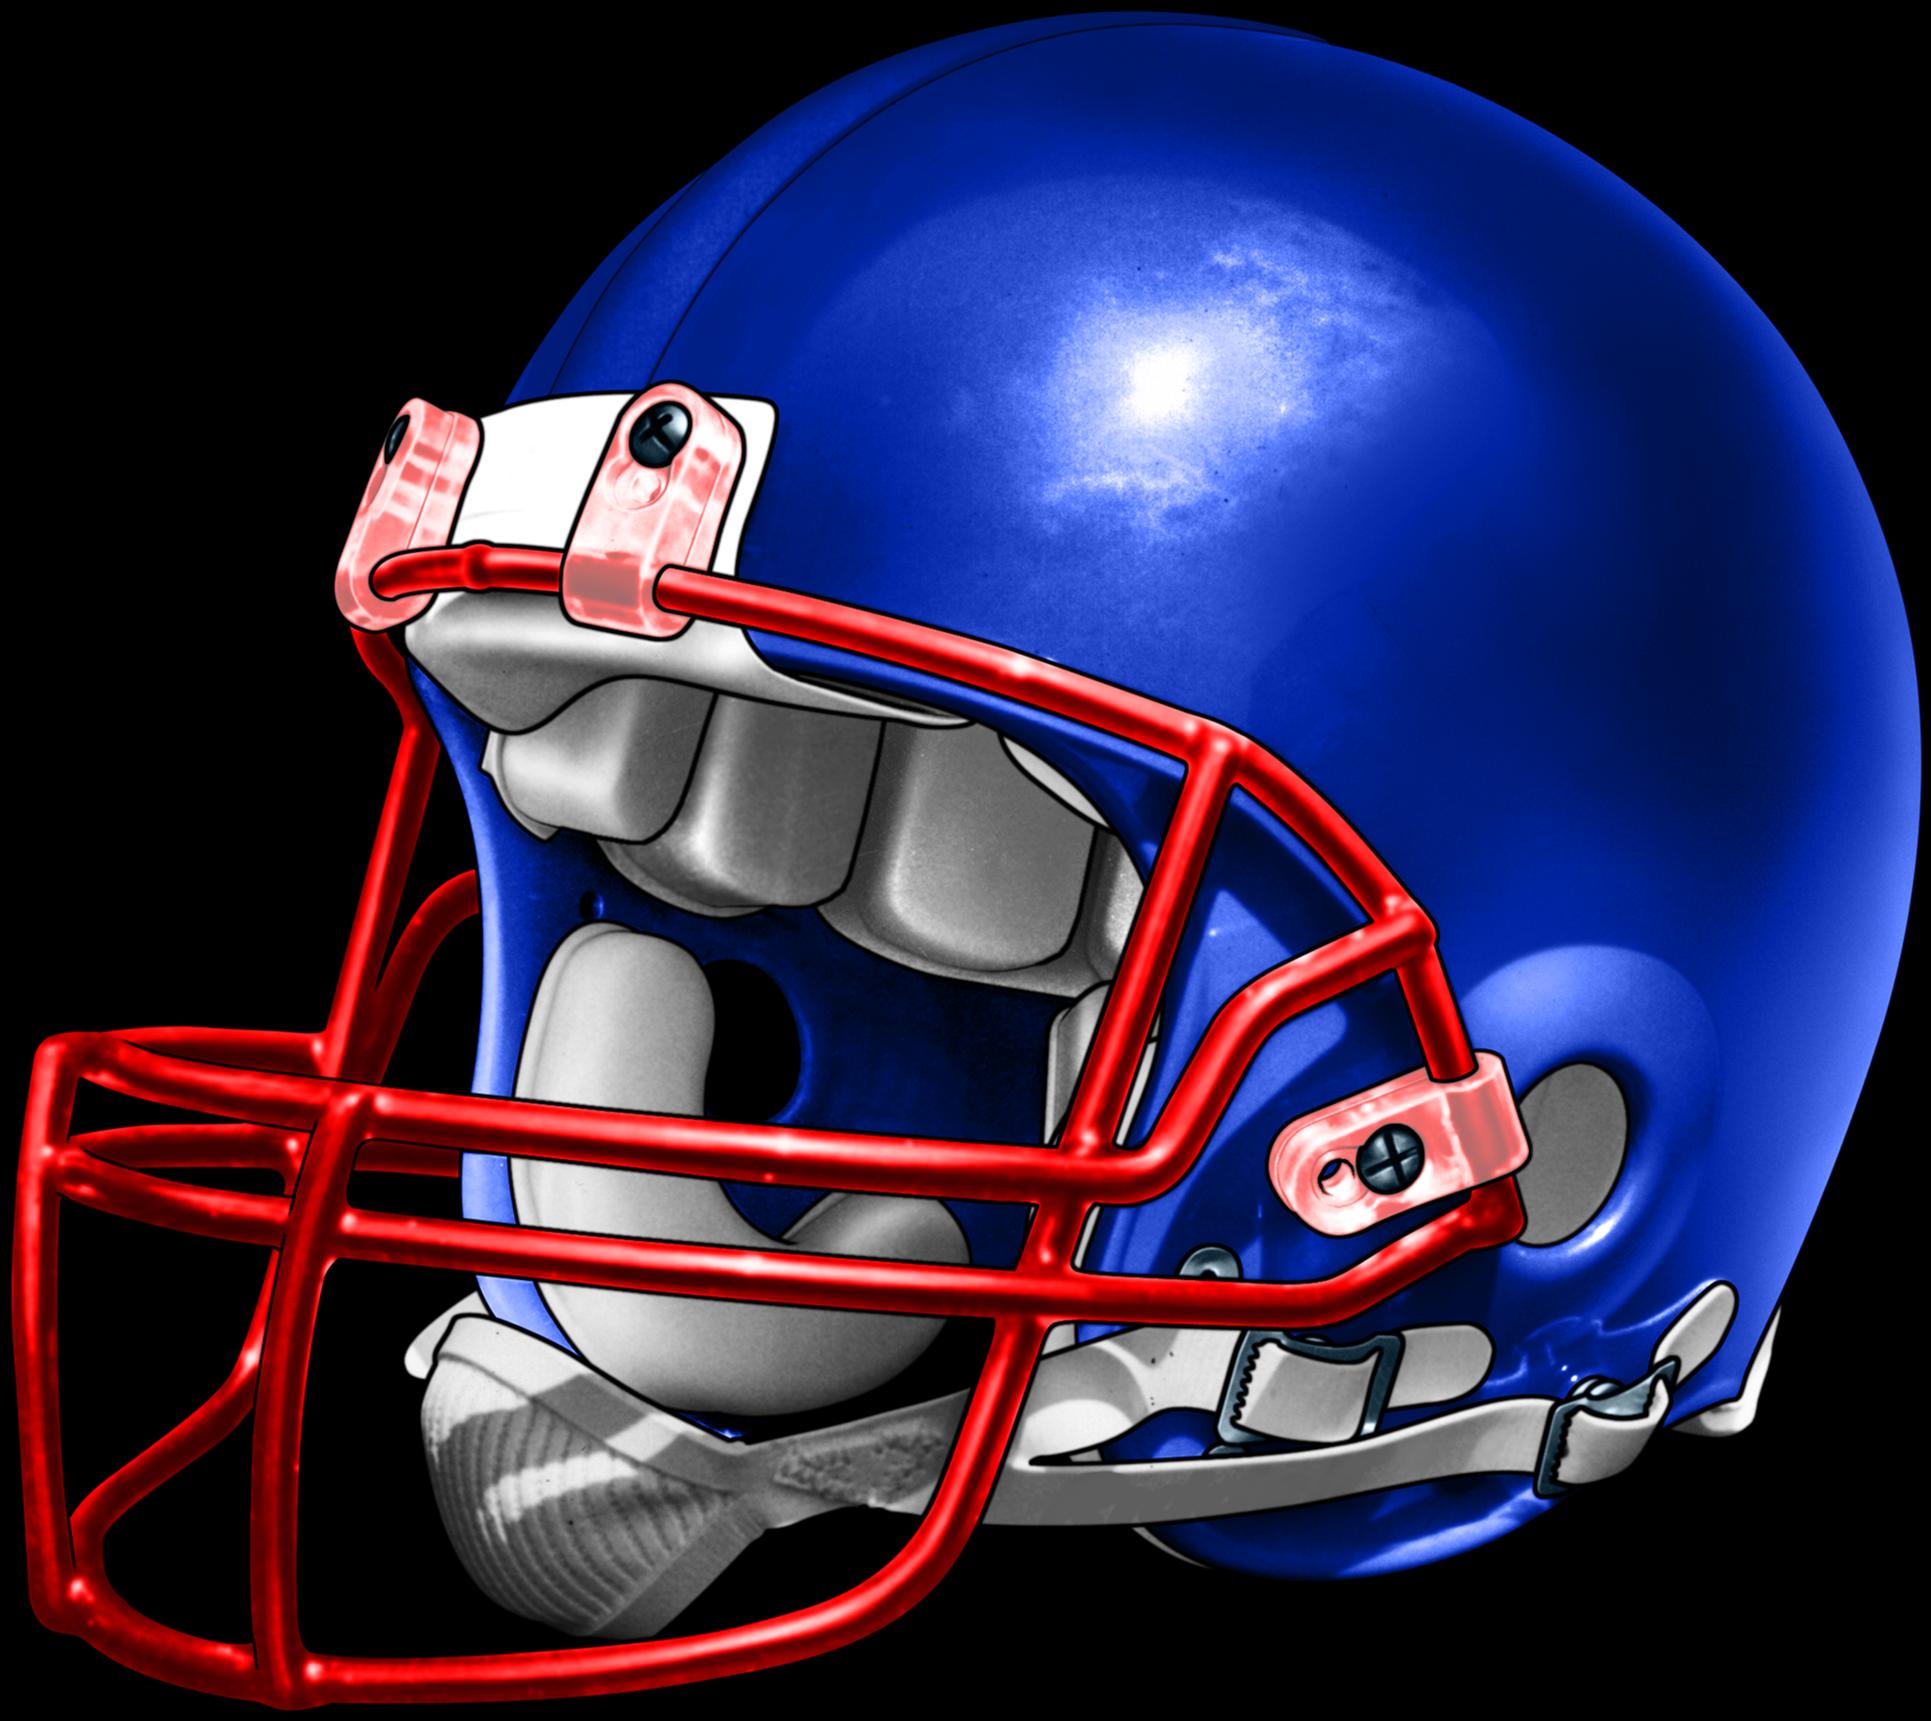 Blue Football Helmets Best On Blue And Red Football Helmet Transparent Cartoon Jing Fm